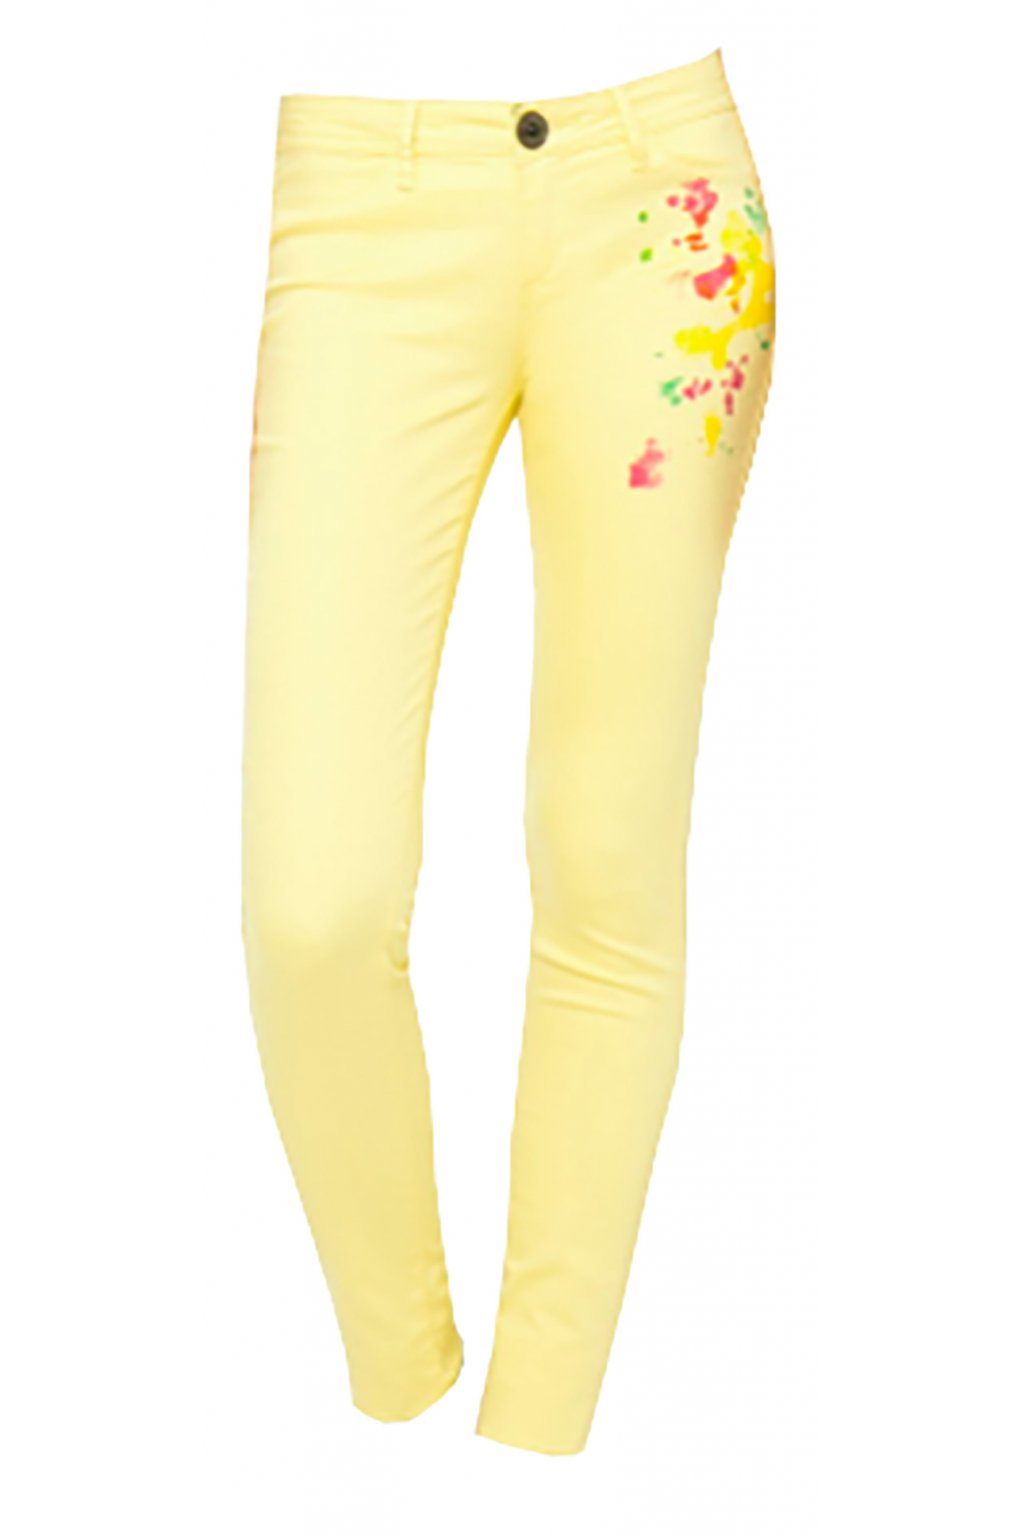 Desigual džíny s barevnými flíčky